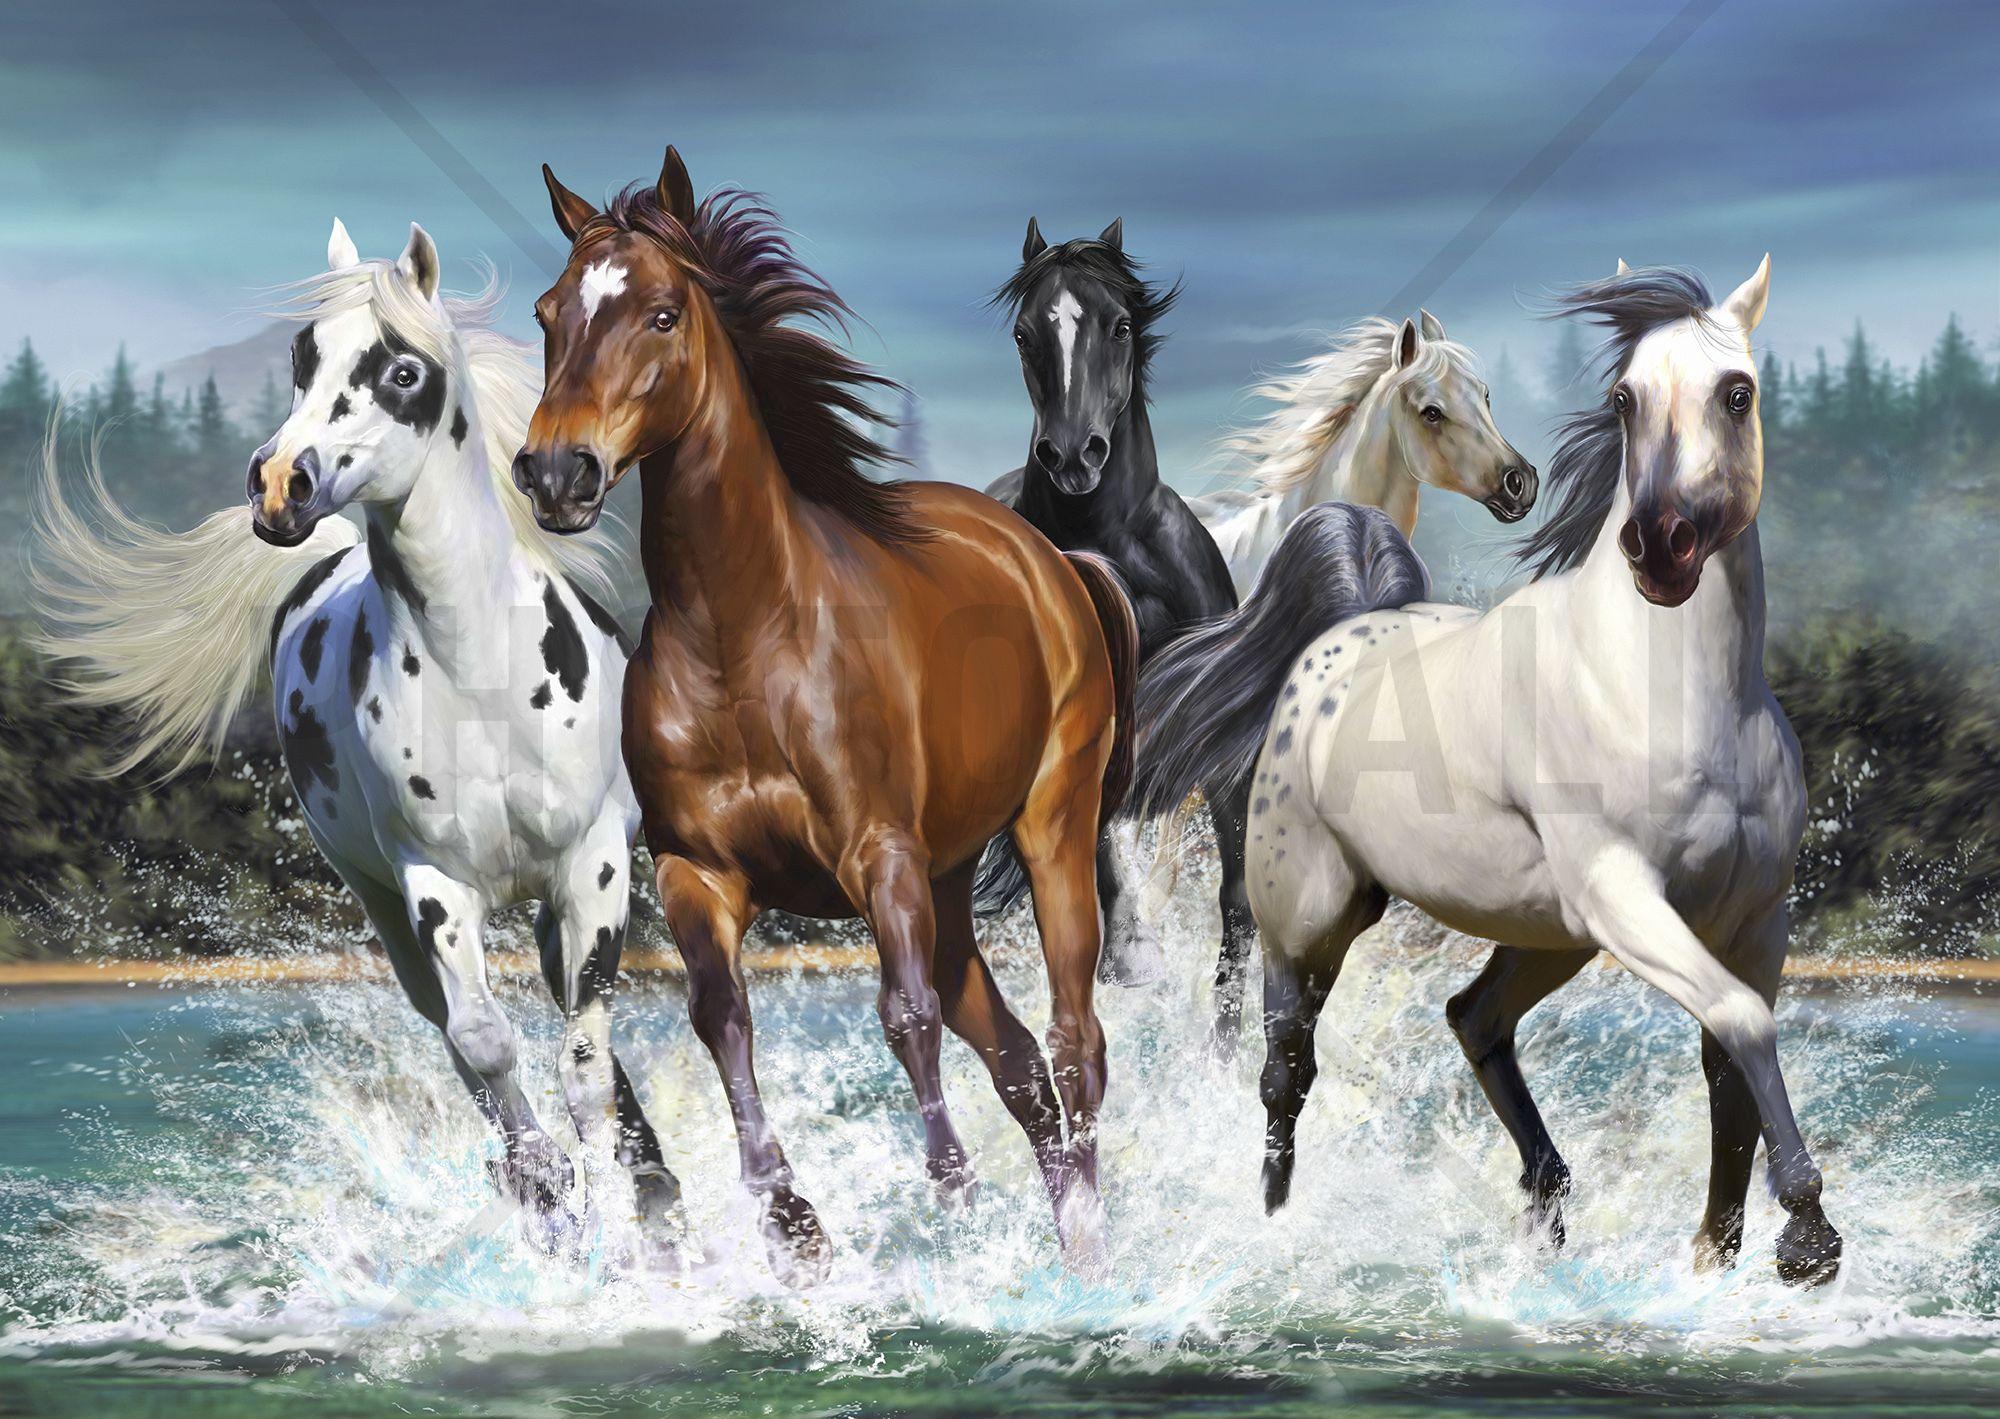 Running Horses Wall Mural Photo Wallpaper Photowall Horse Wallpaper Horse Painting Horses